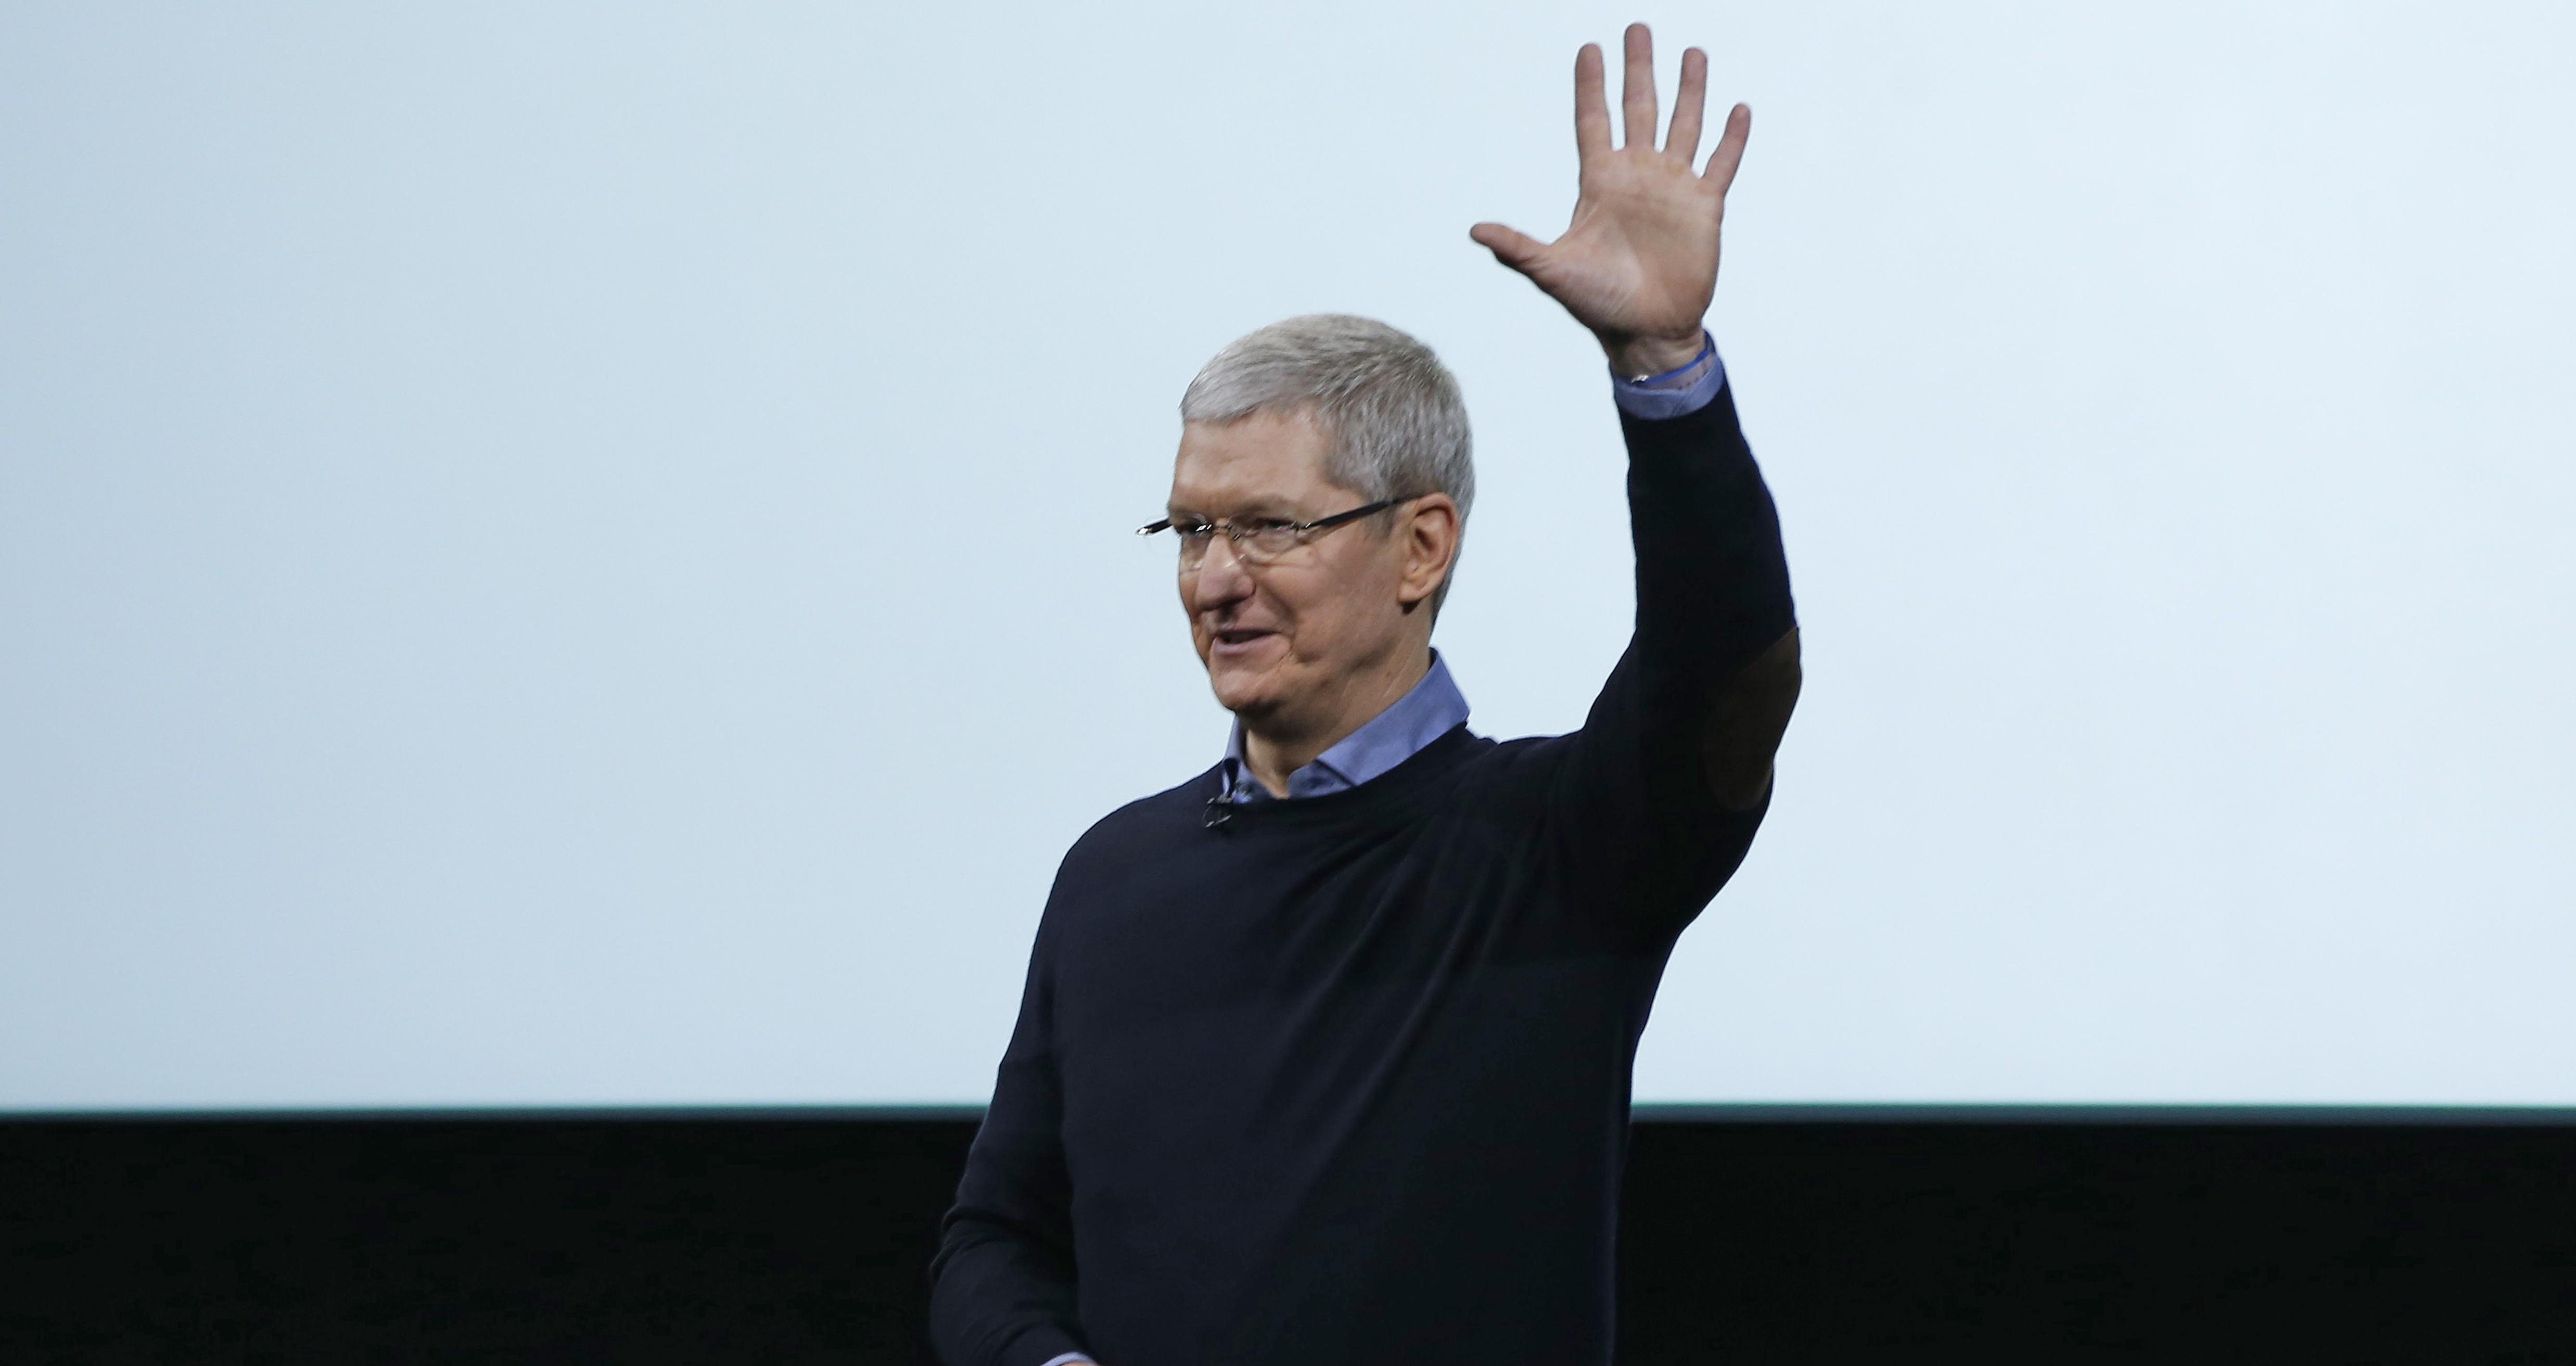 CEOs needn't be shy